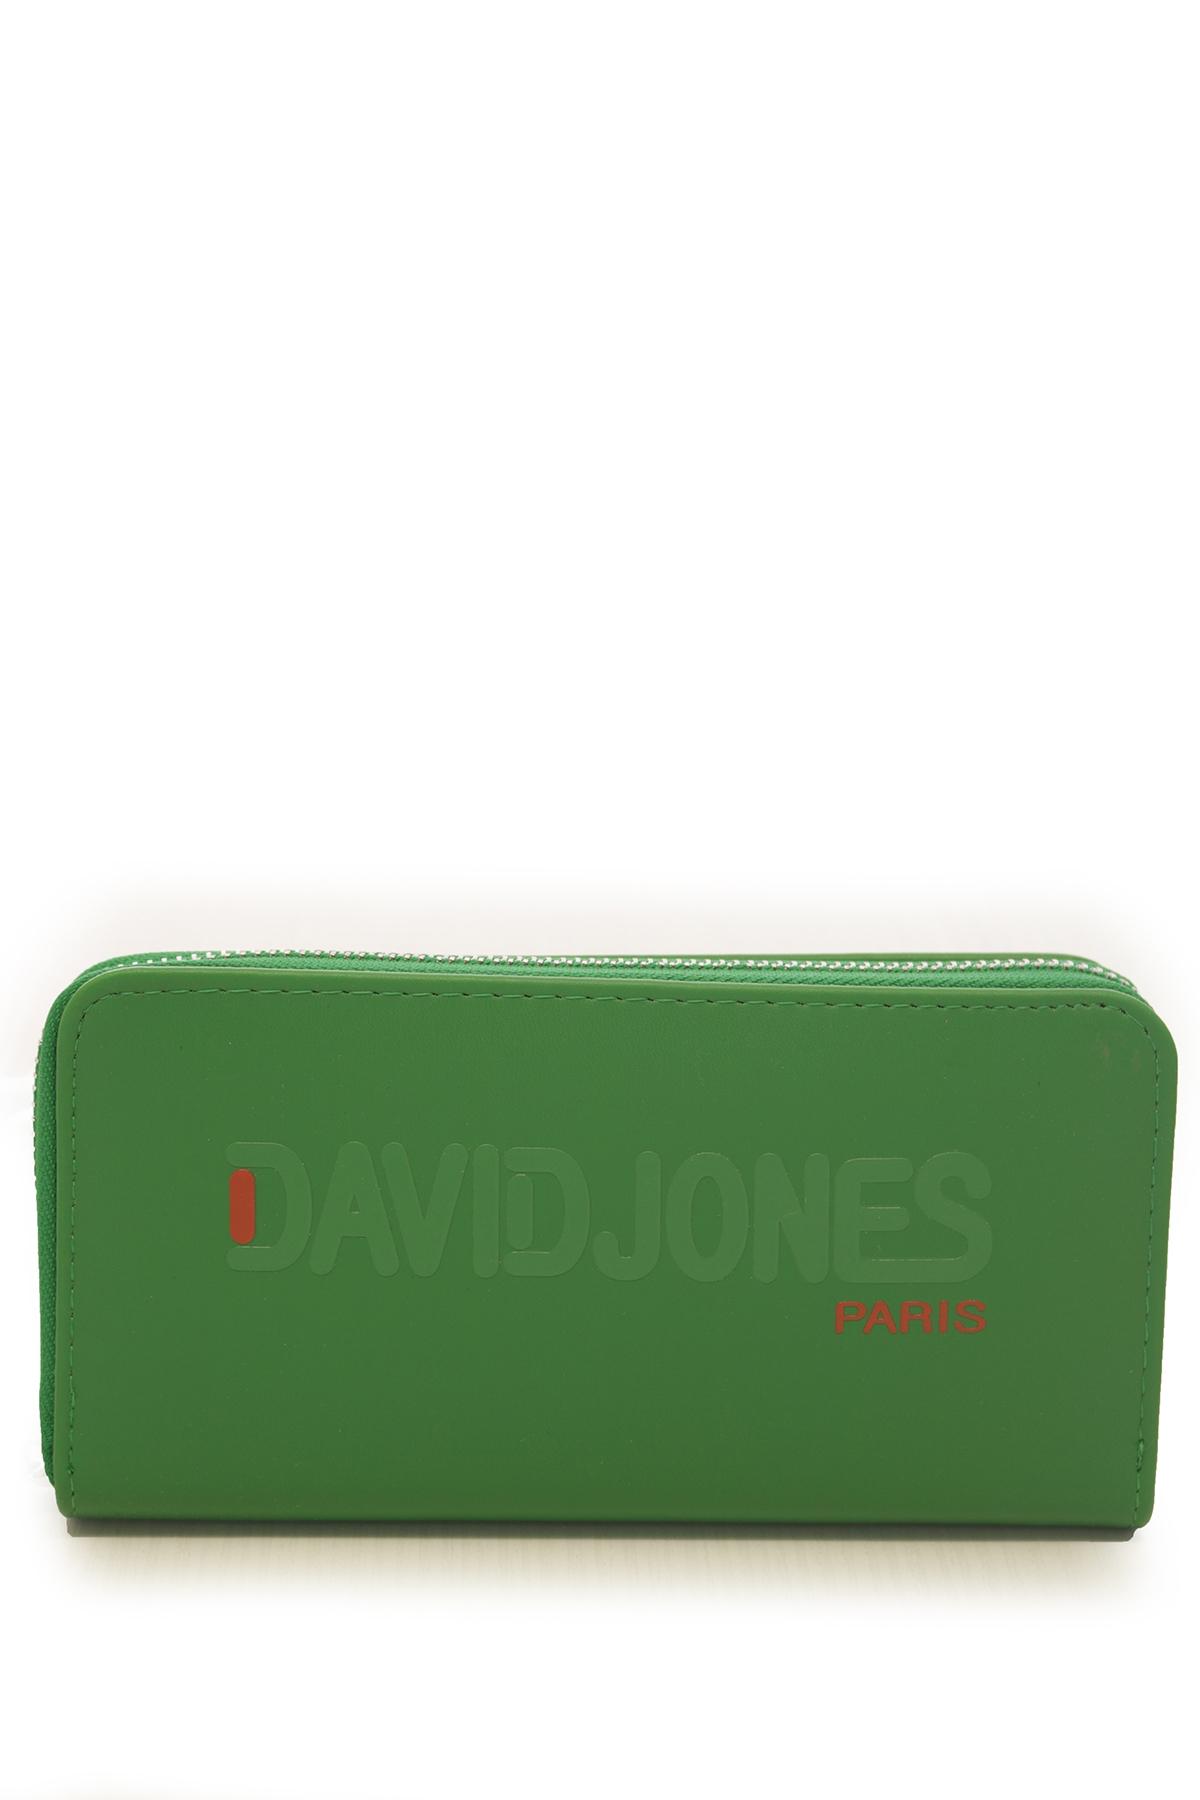 Кошелек David Jones P091 оптом